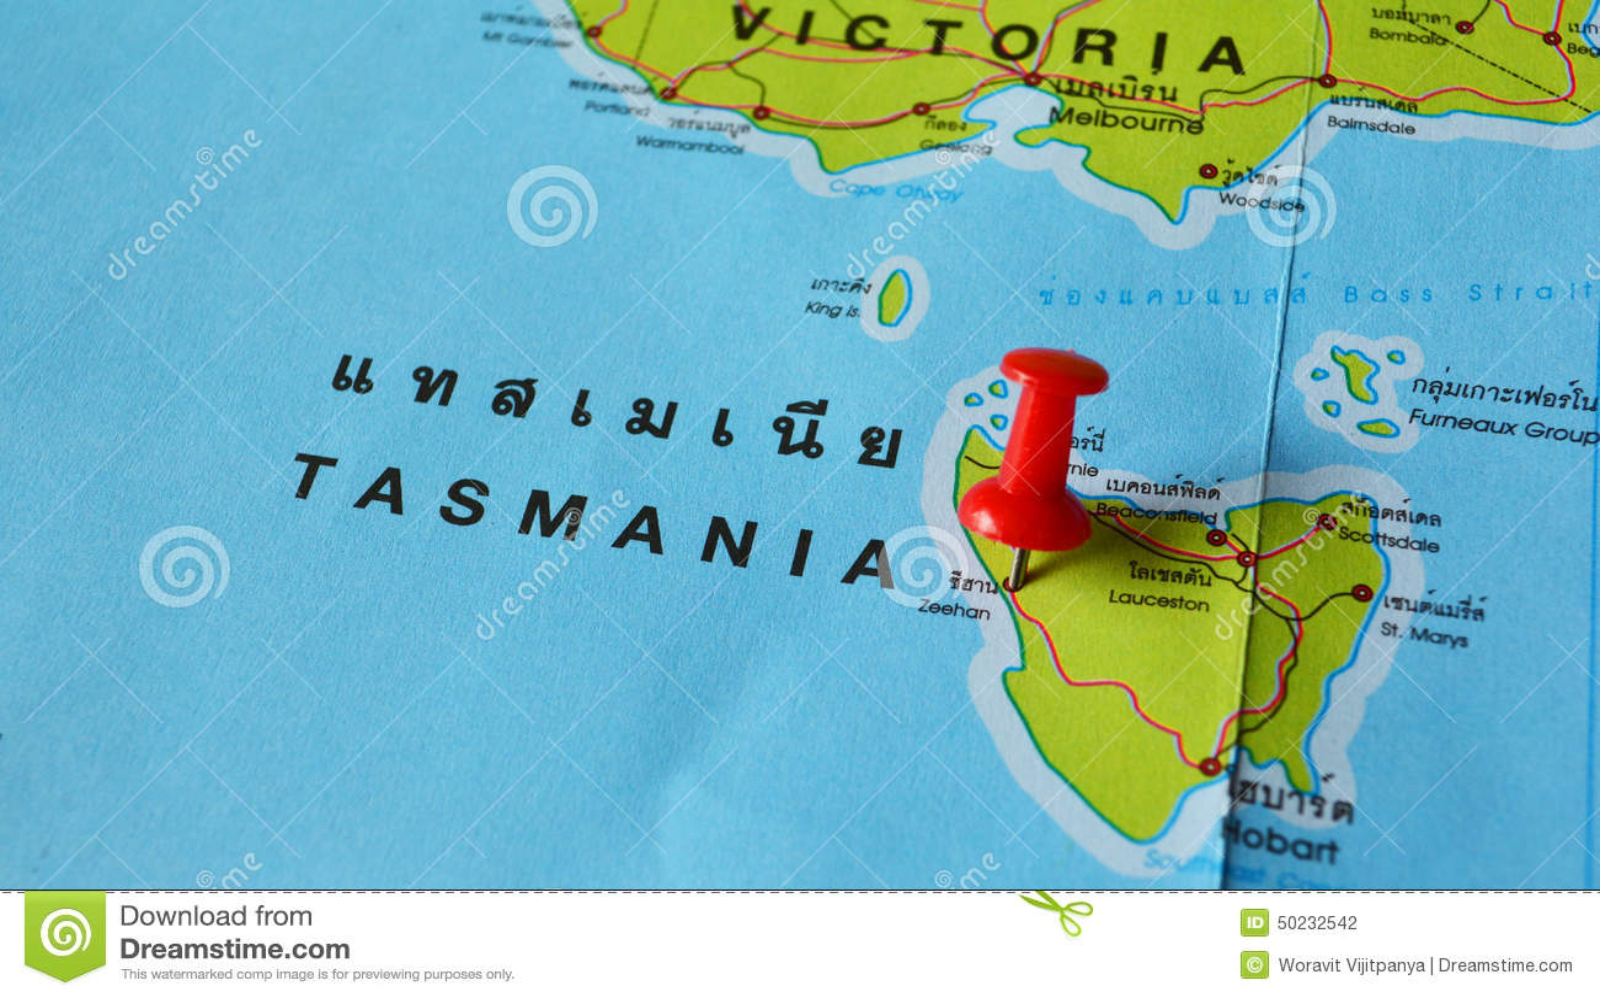 tasmânia mapa Mapa de Tasmânia ilustração stock. Ilustração de planta   50232542 tasmânia mapa